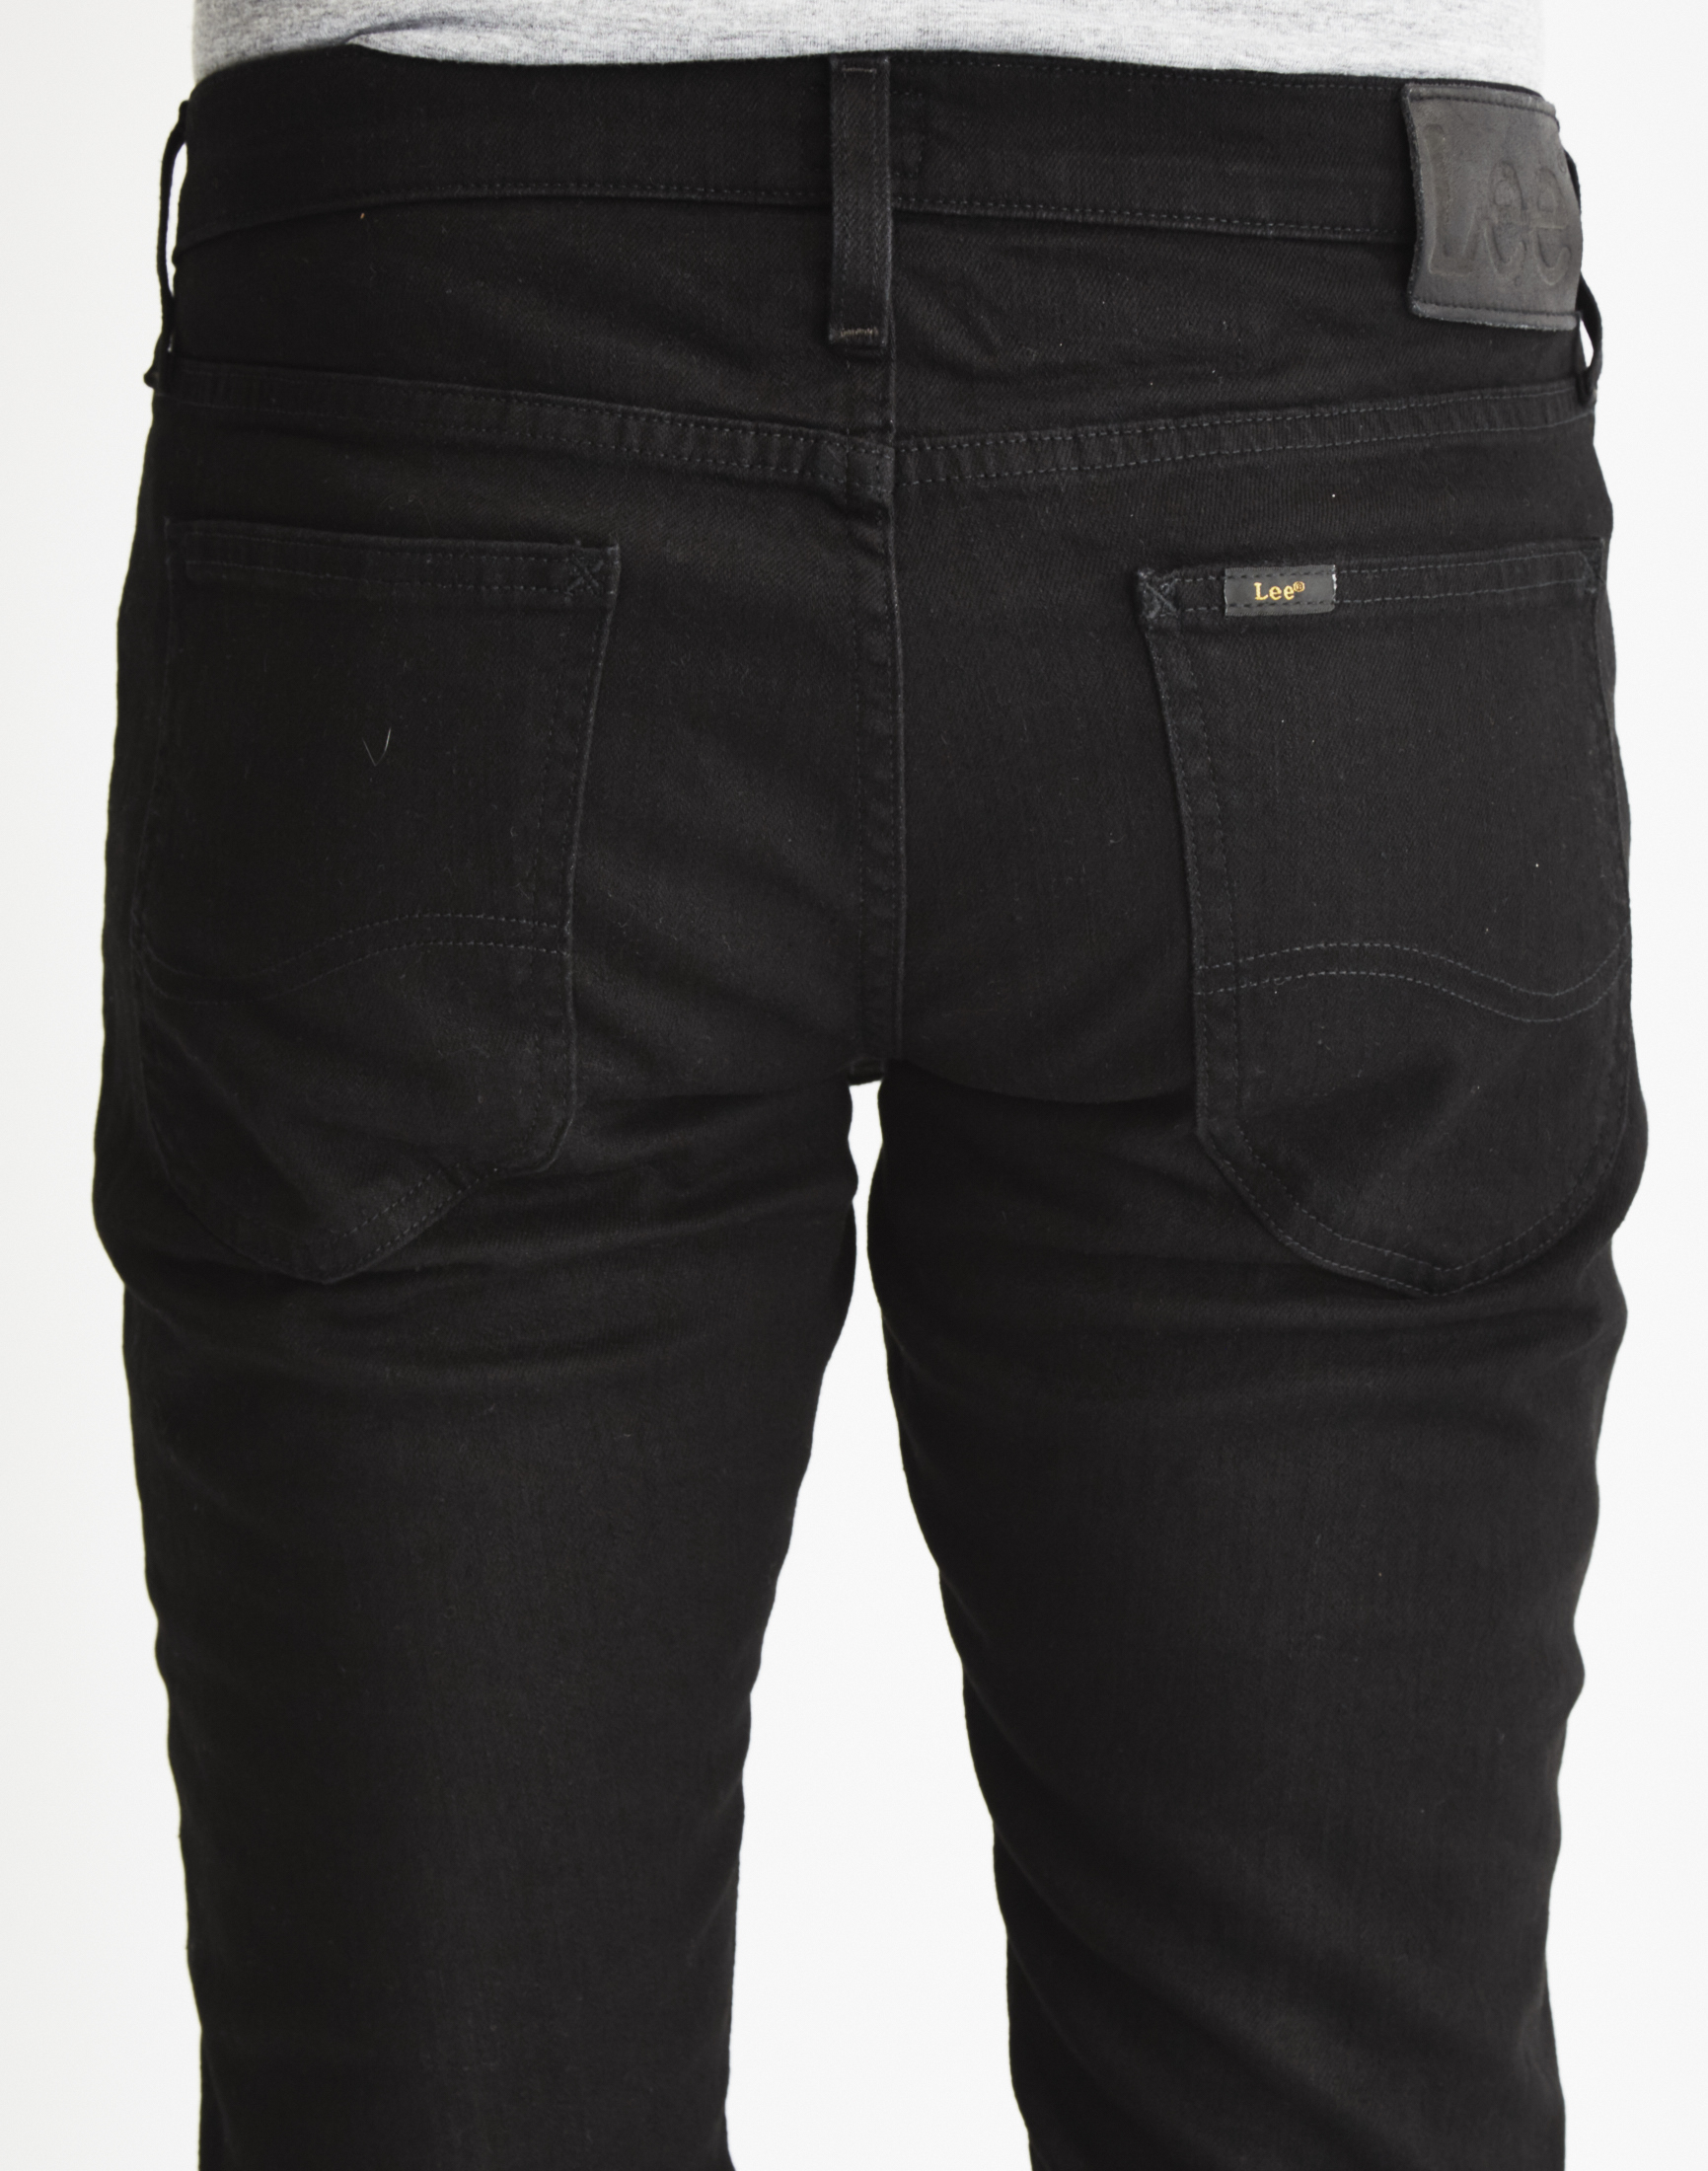 b88dfd04 Lee Jeans Luke Slim Tappered Jeans In Clean Black in Black for Men ...